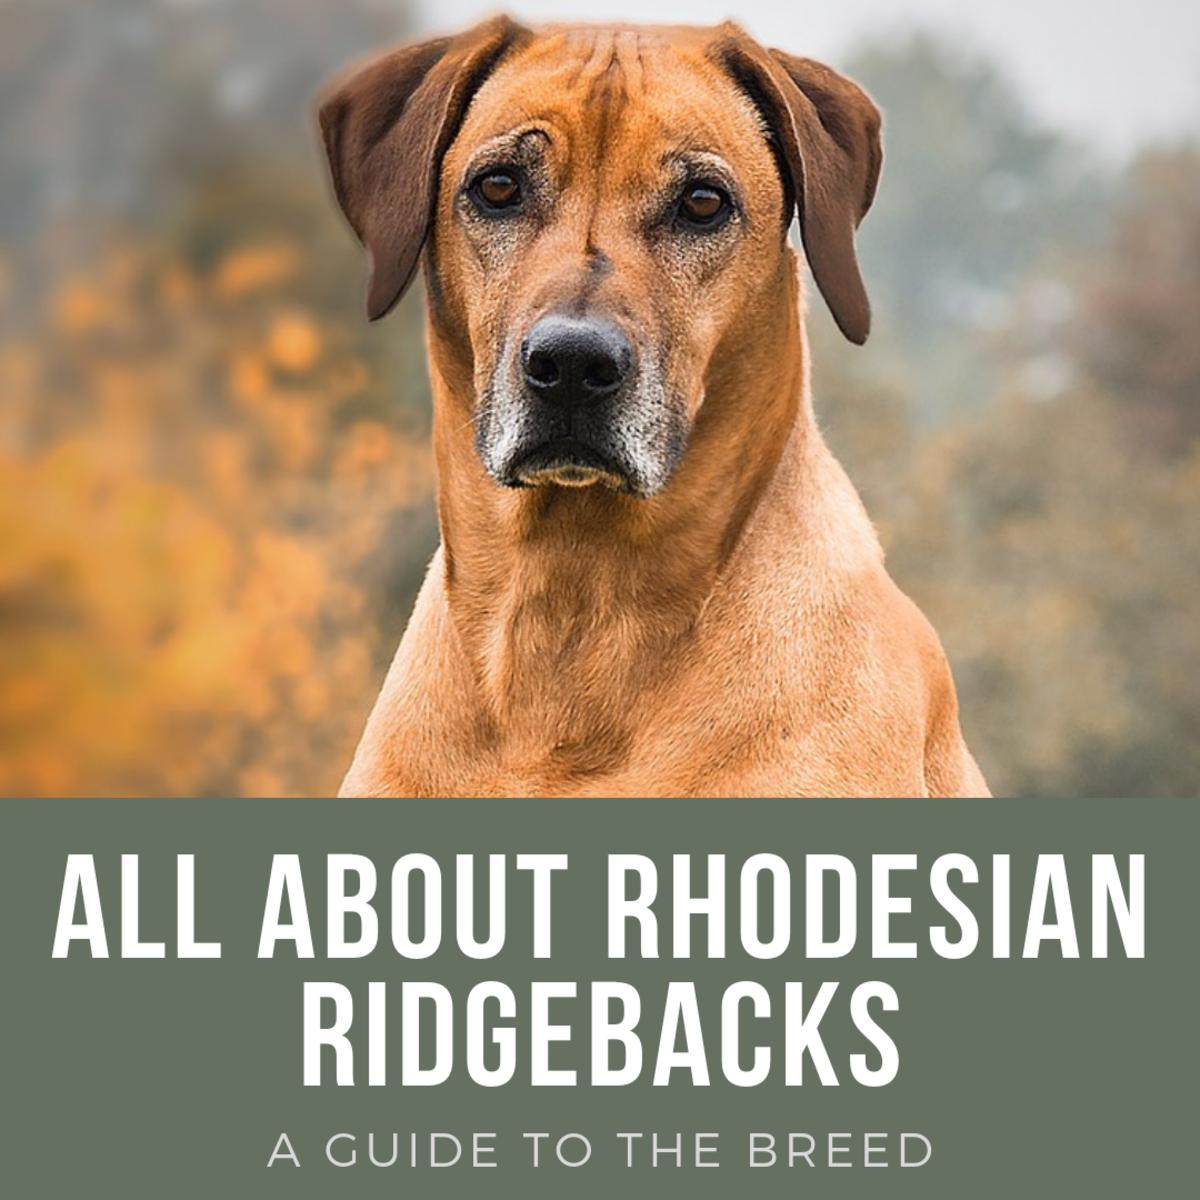 Rhodesian Ridgeback: Breed History, Temperament, and FAQs